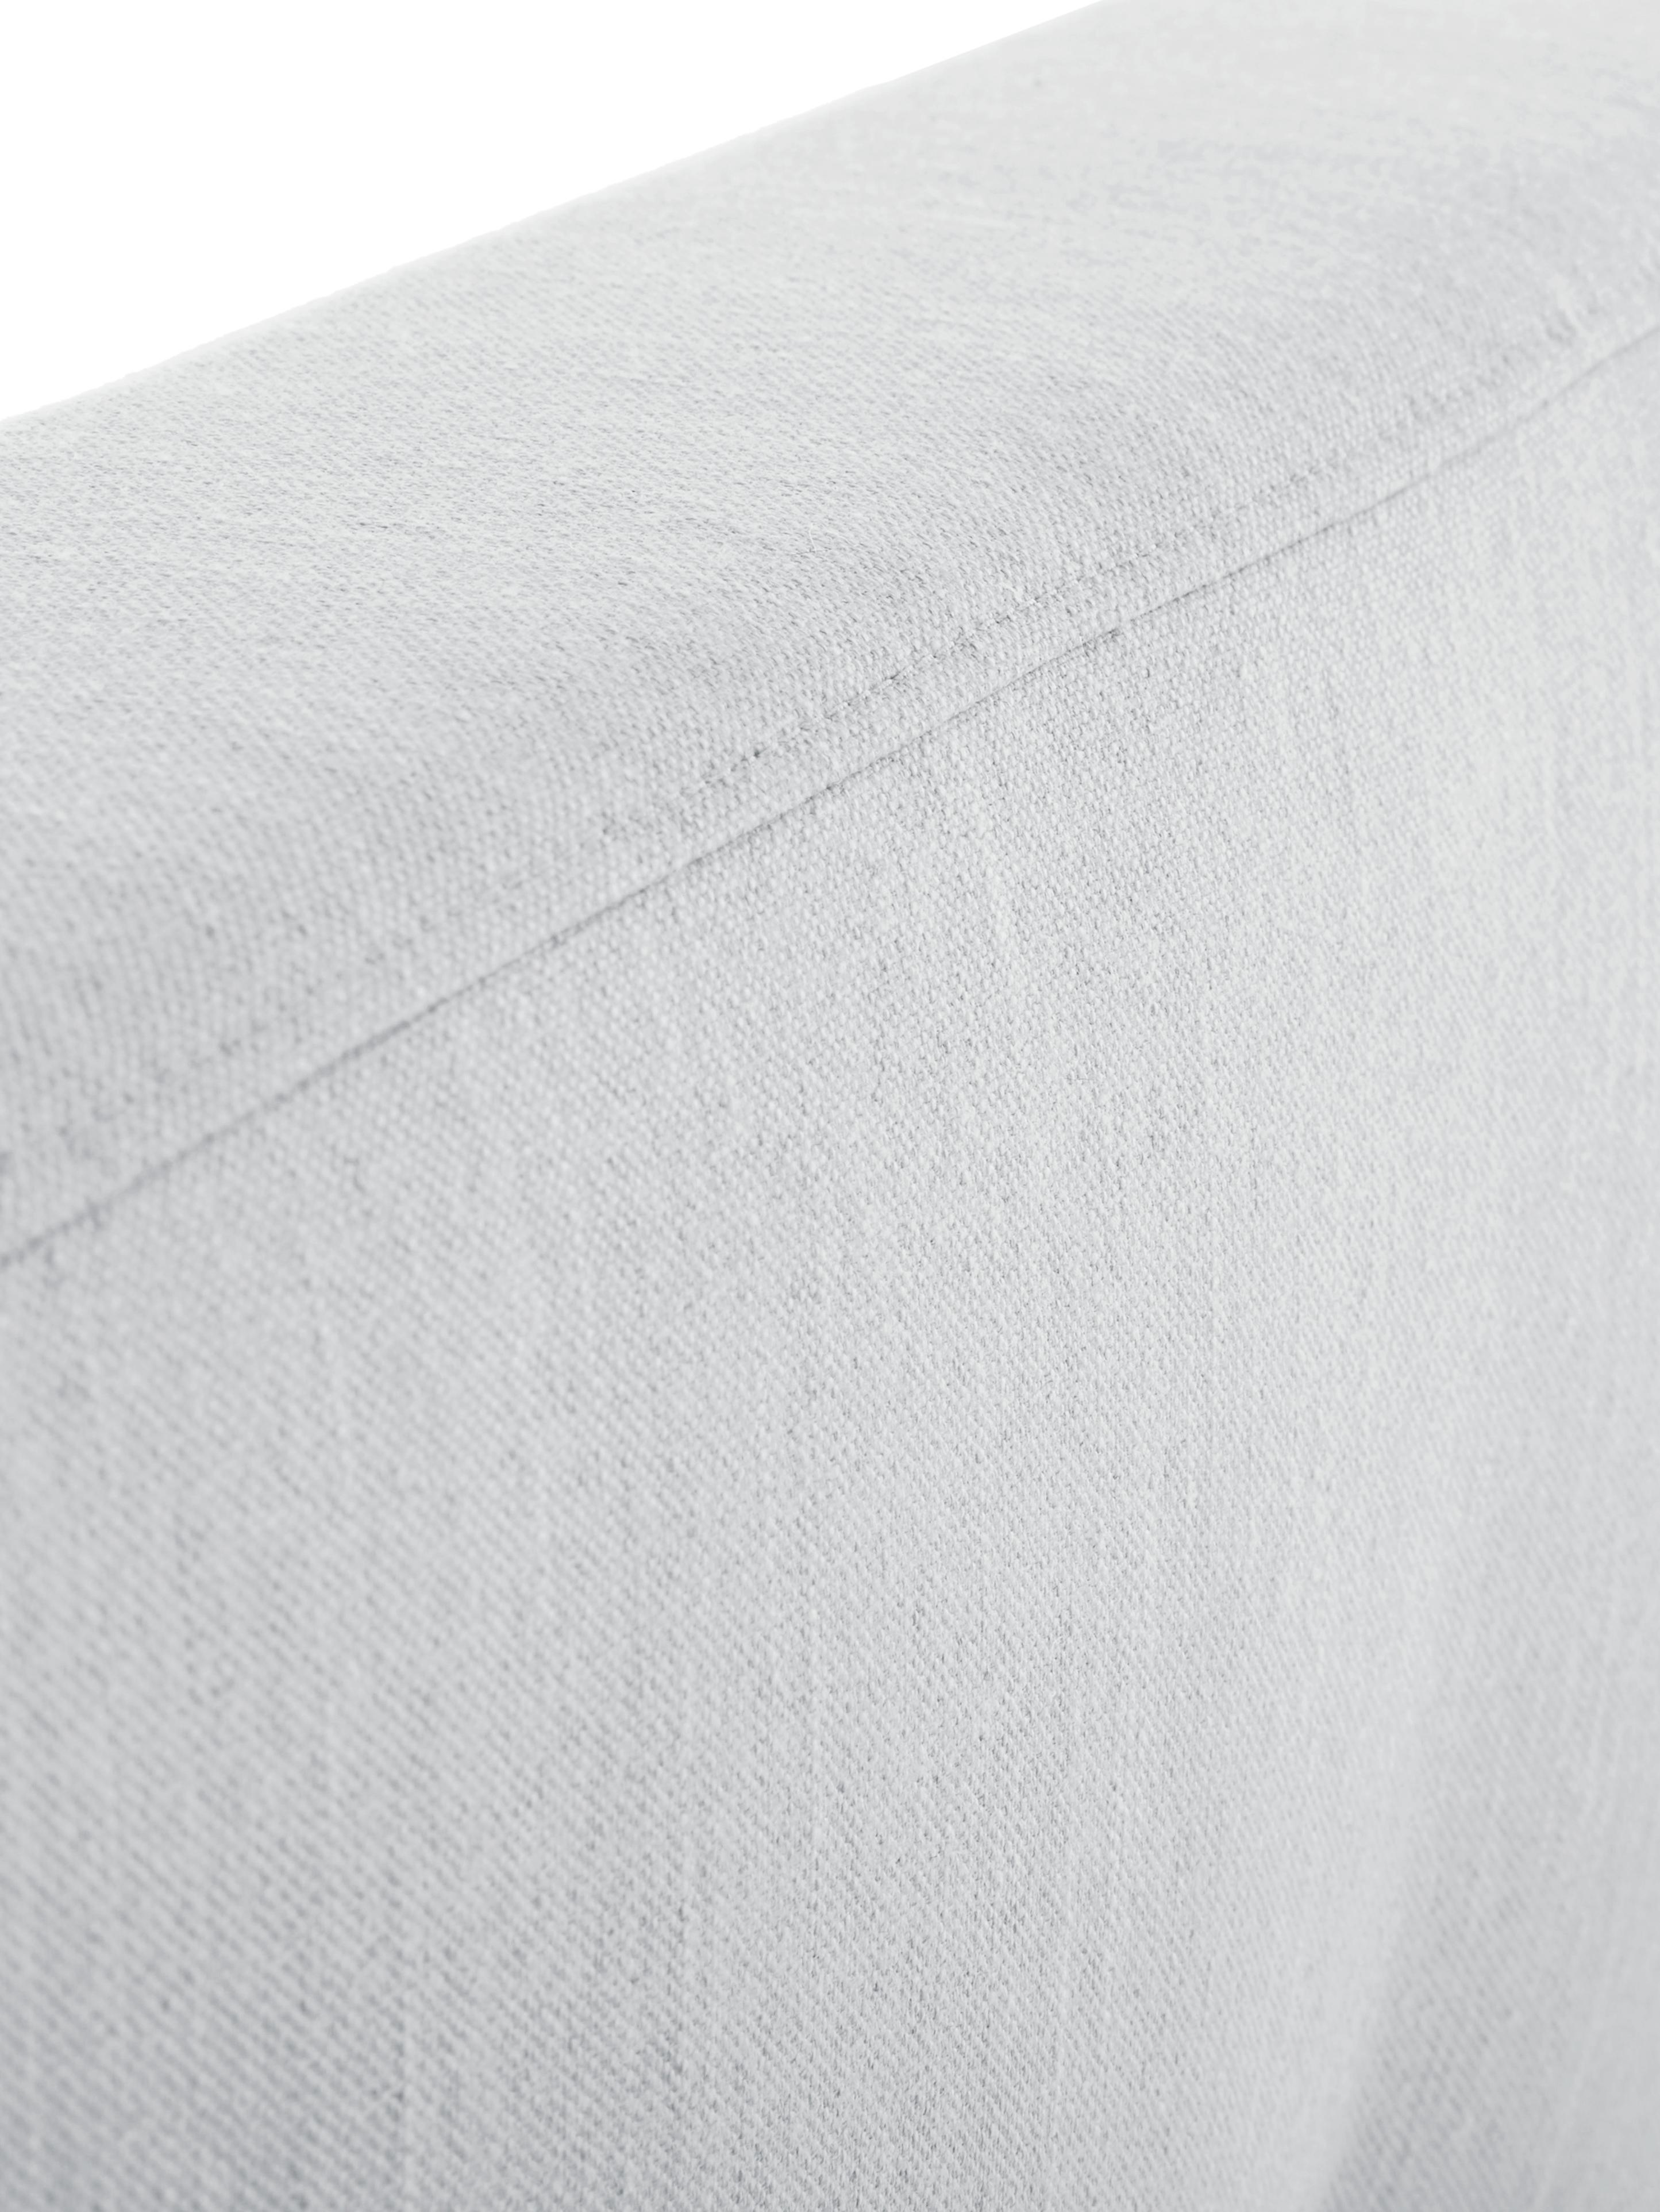 Polsterbett Moon, Korpus: Massives Kiefernholz, Füße: Massives Eichenholz, Bezug: Polyester (Strukturstoff), Hellgrau, 180 x 200 cm